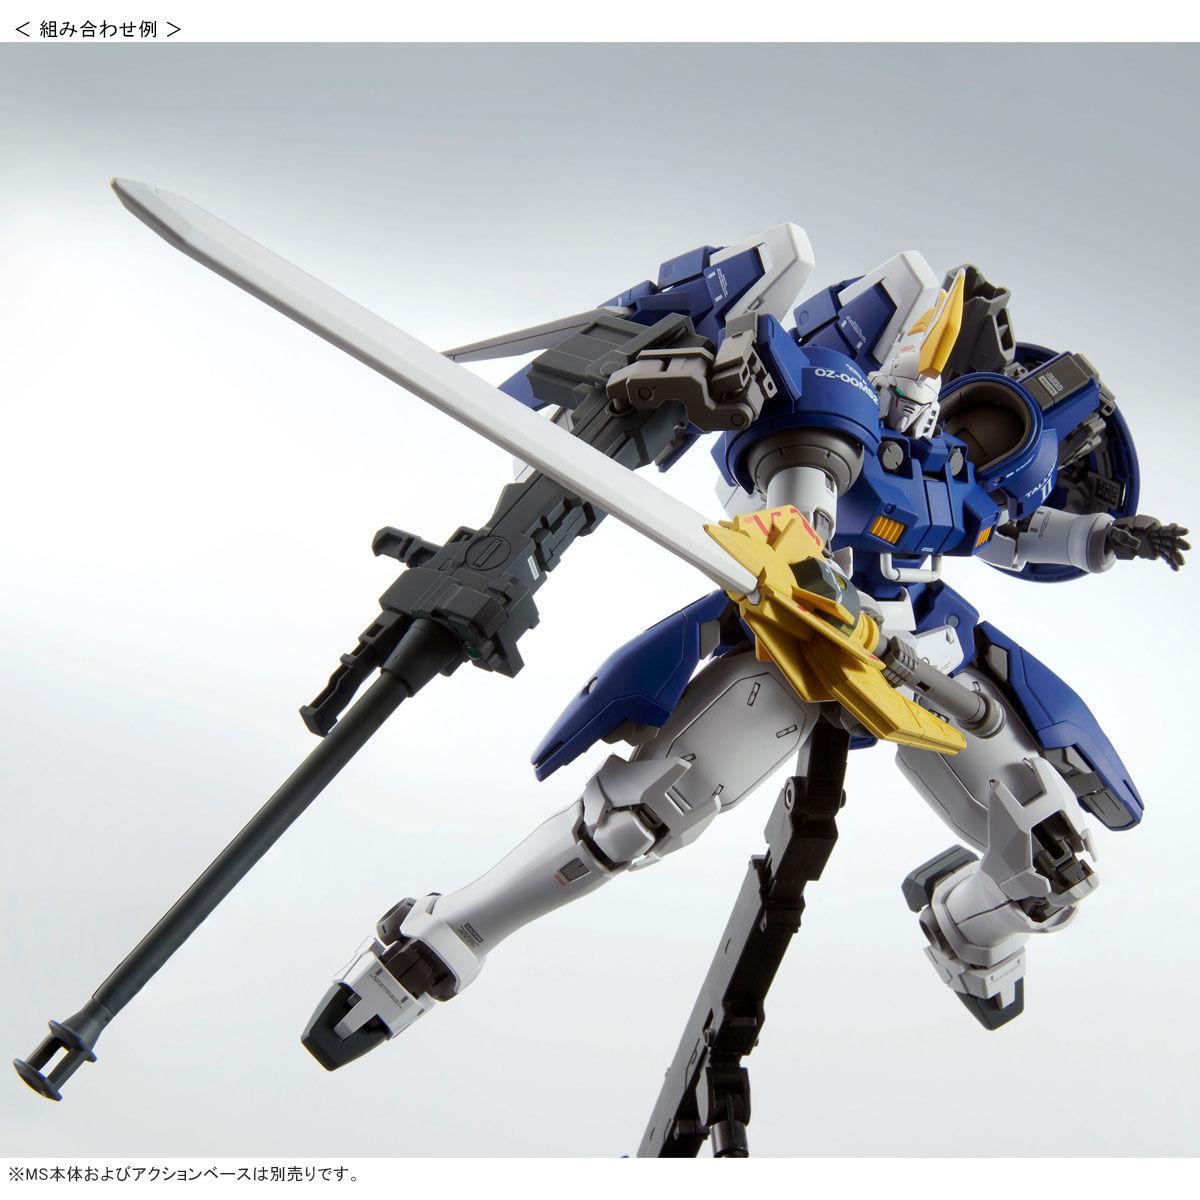 MG 1/100 Expansion Parts Set for OZ-00MS2 Tallgeese Ⅱ+XXXG-01S2 Altron Gundam EW+XXXG-01D2 Gundam Deathscythe Hell EW